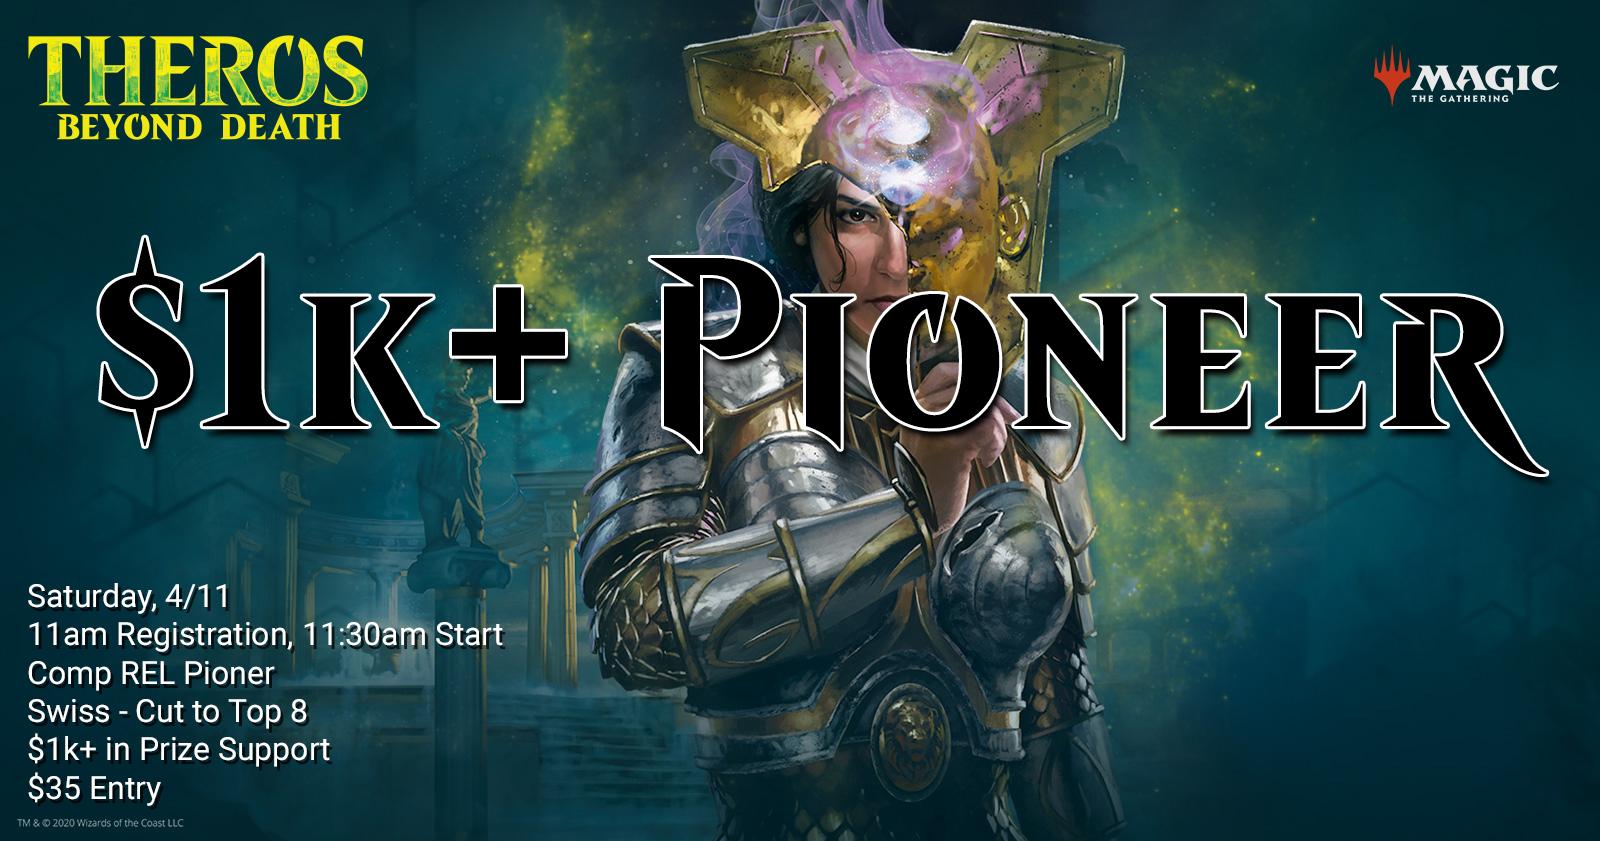 $1k+ Pioneer - Sunday April 12th 11am